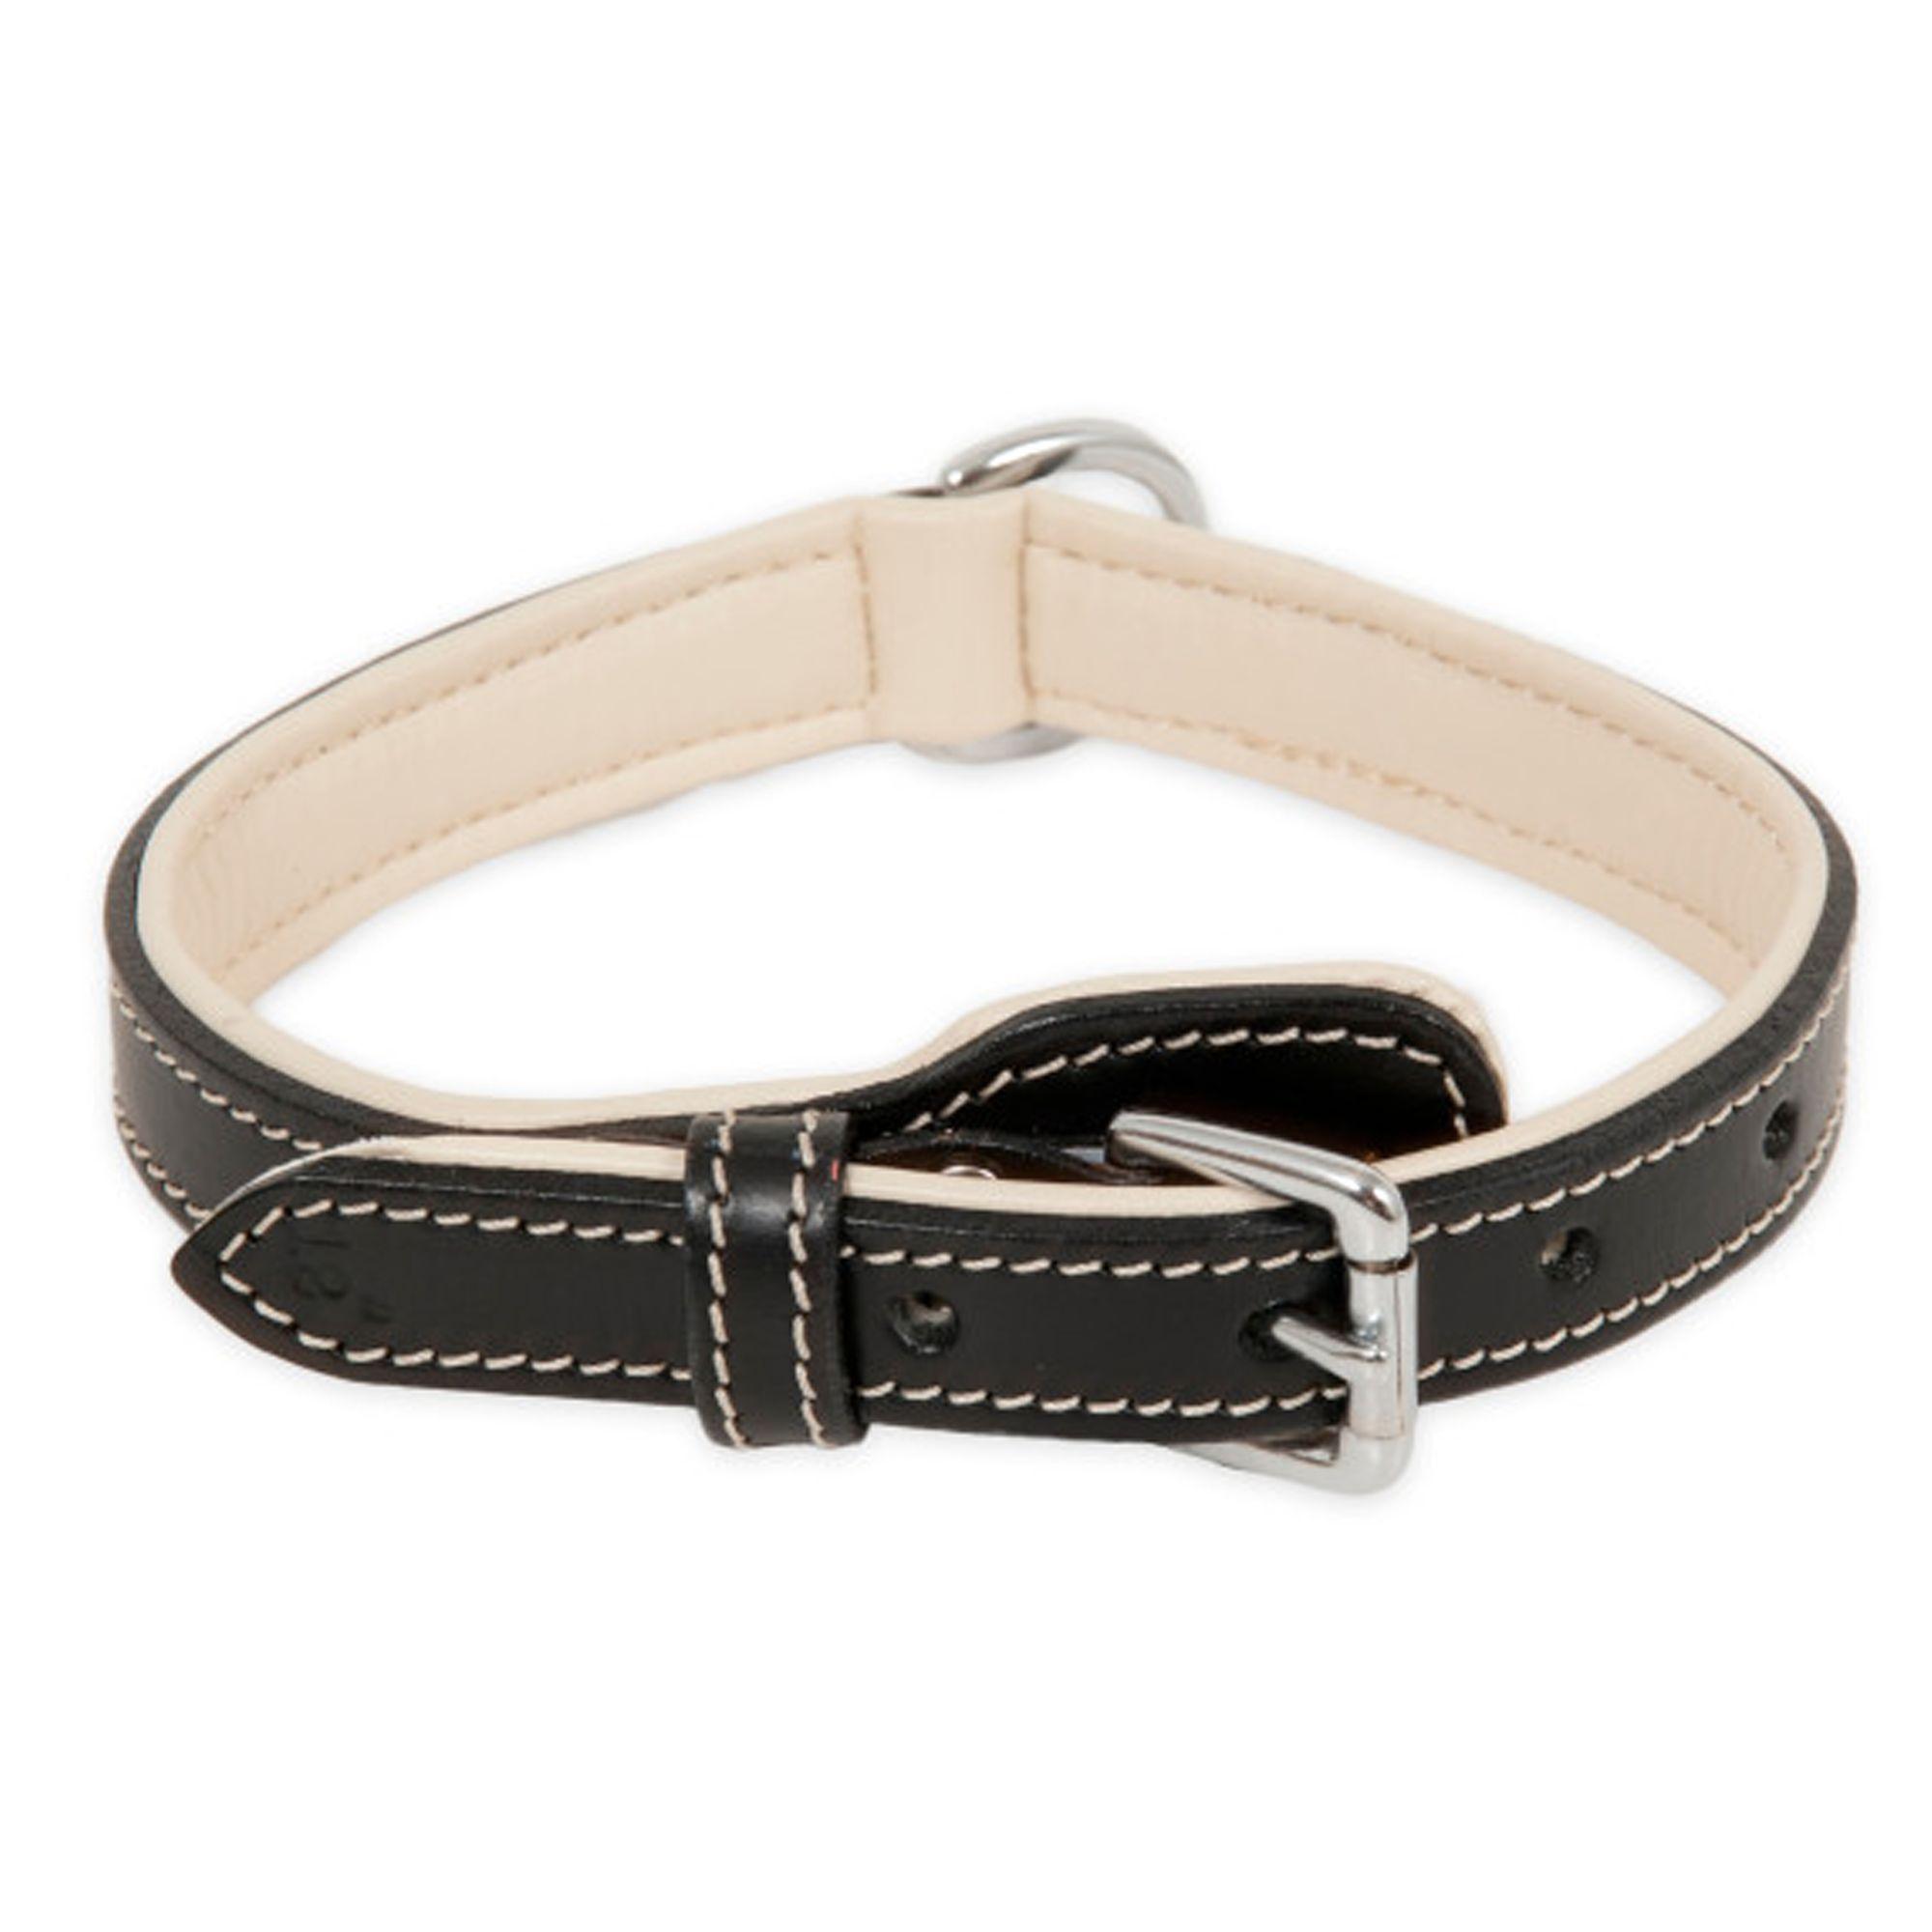 "Petmate® Dog Collar size: 20""L x 1""W, Black & Cream 5202112"